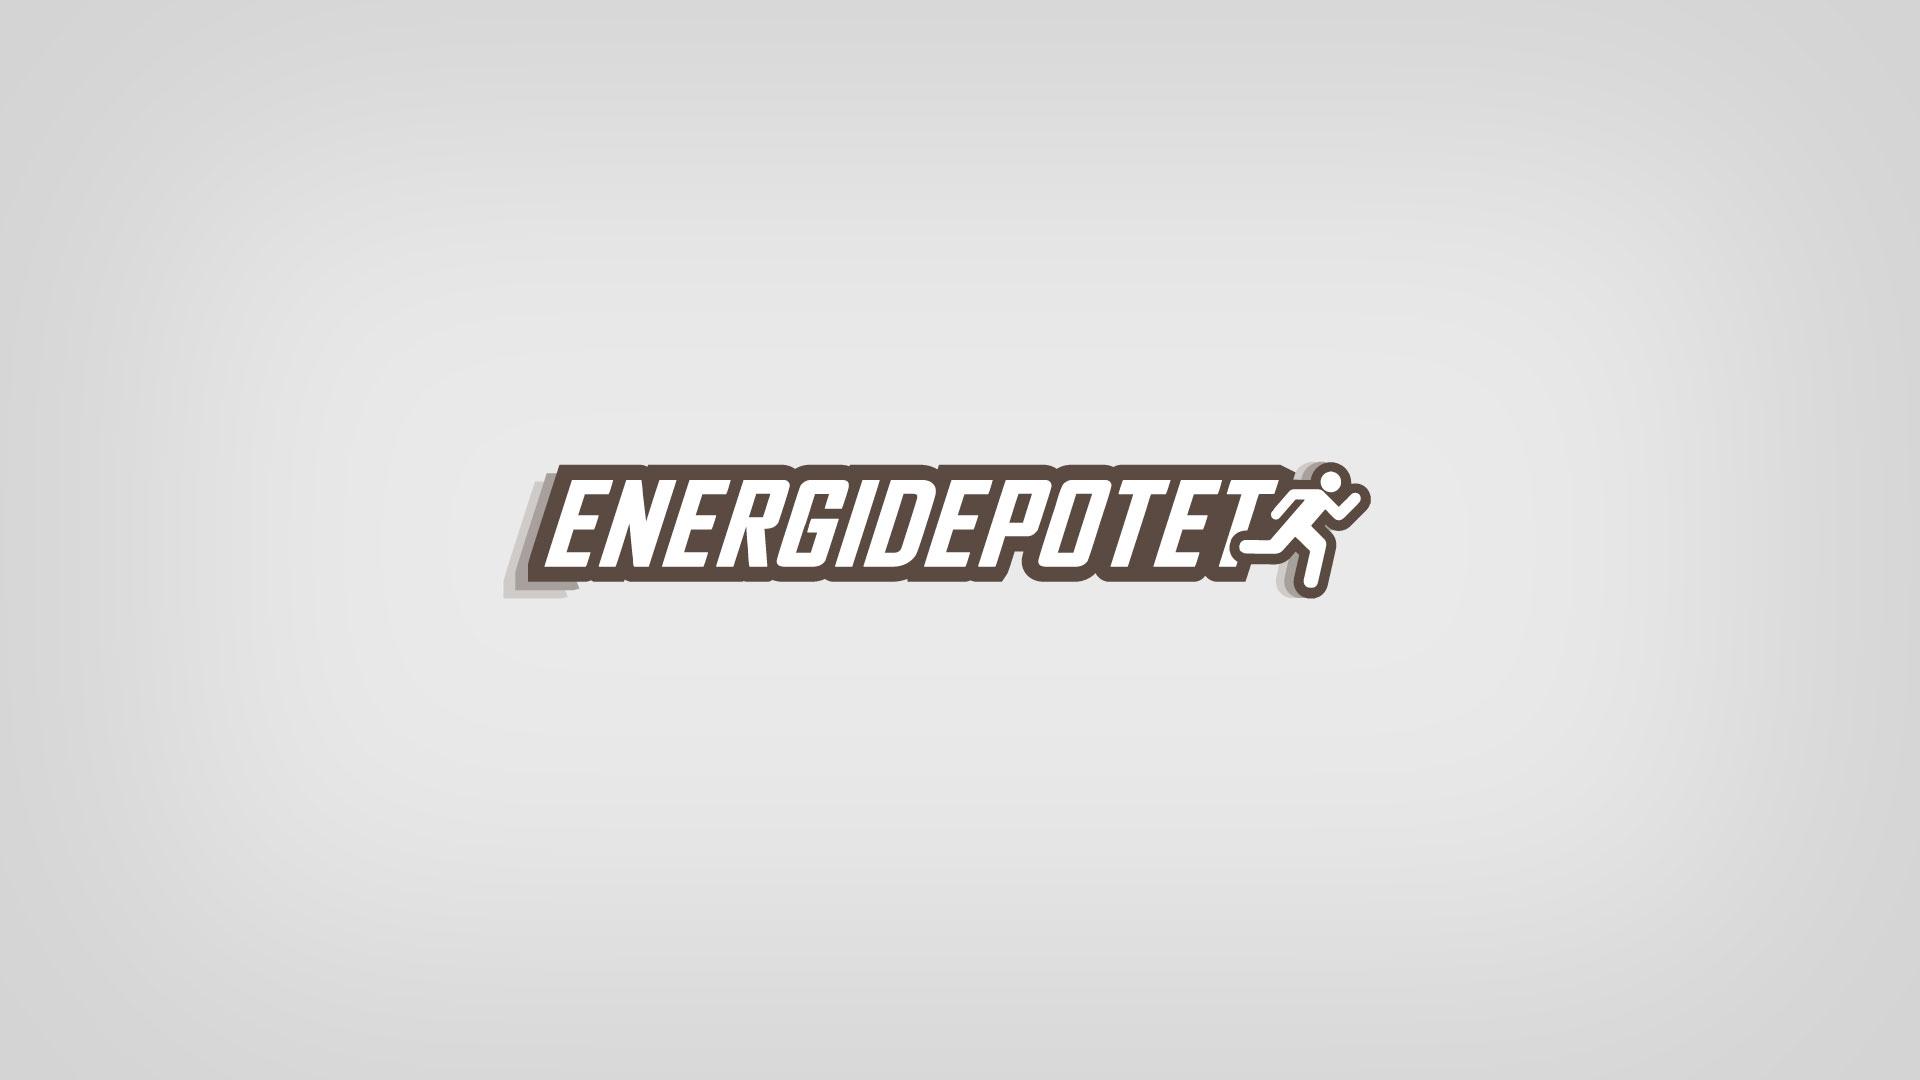 Energidepotet.dk logo